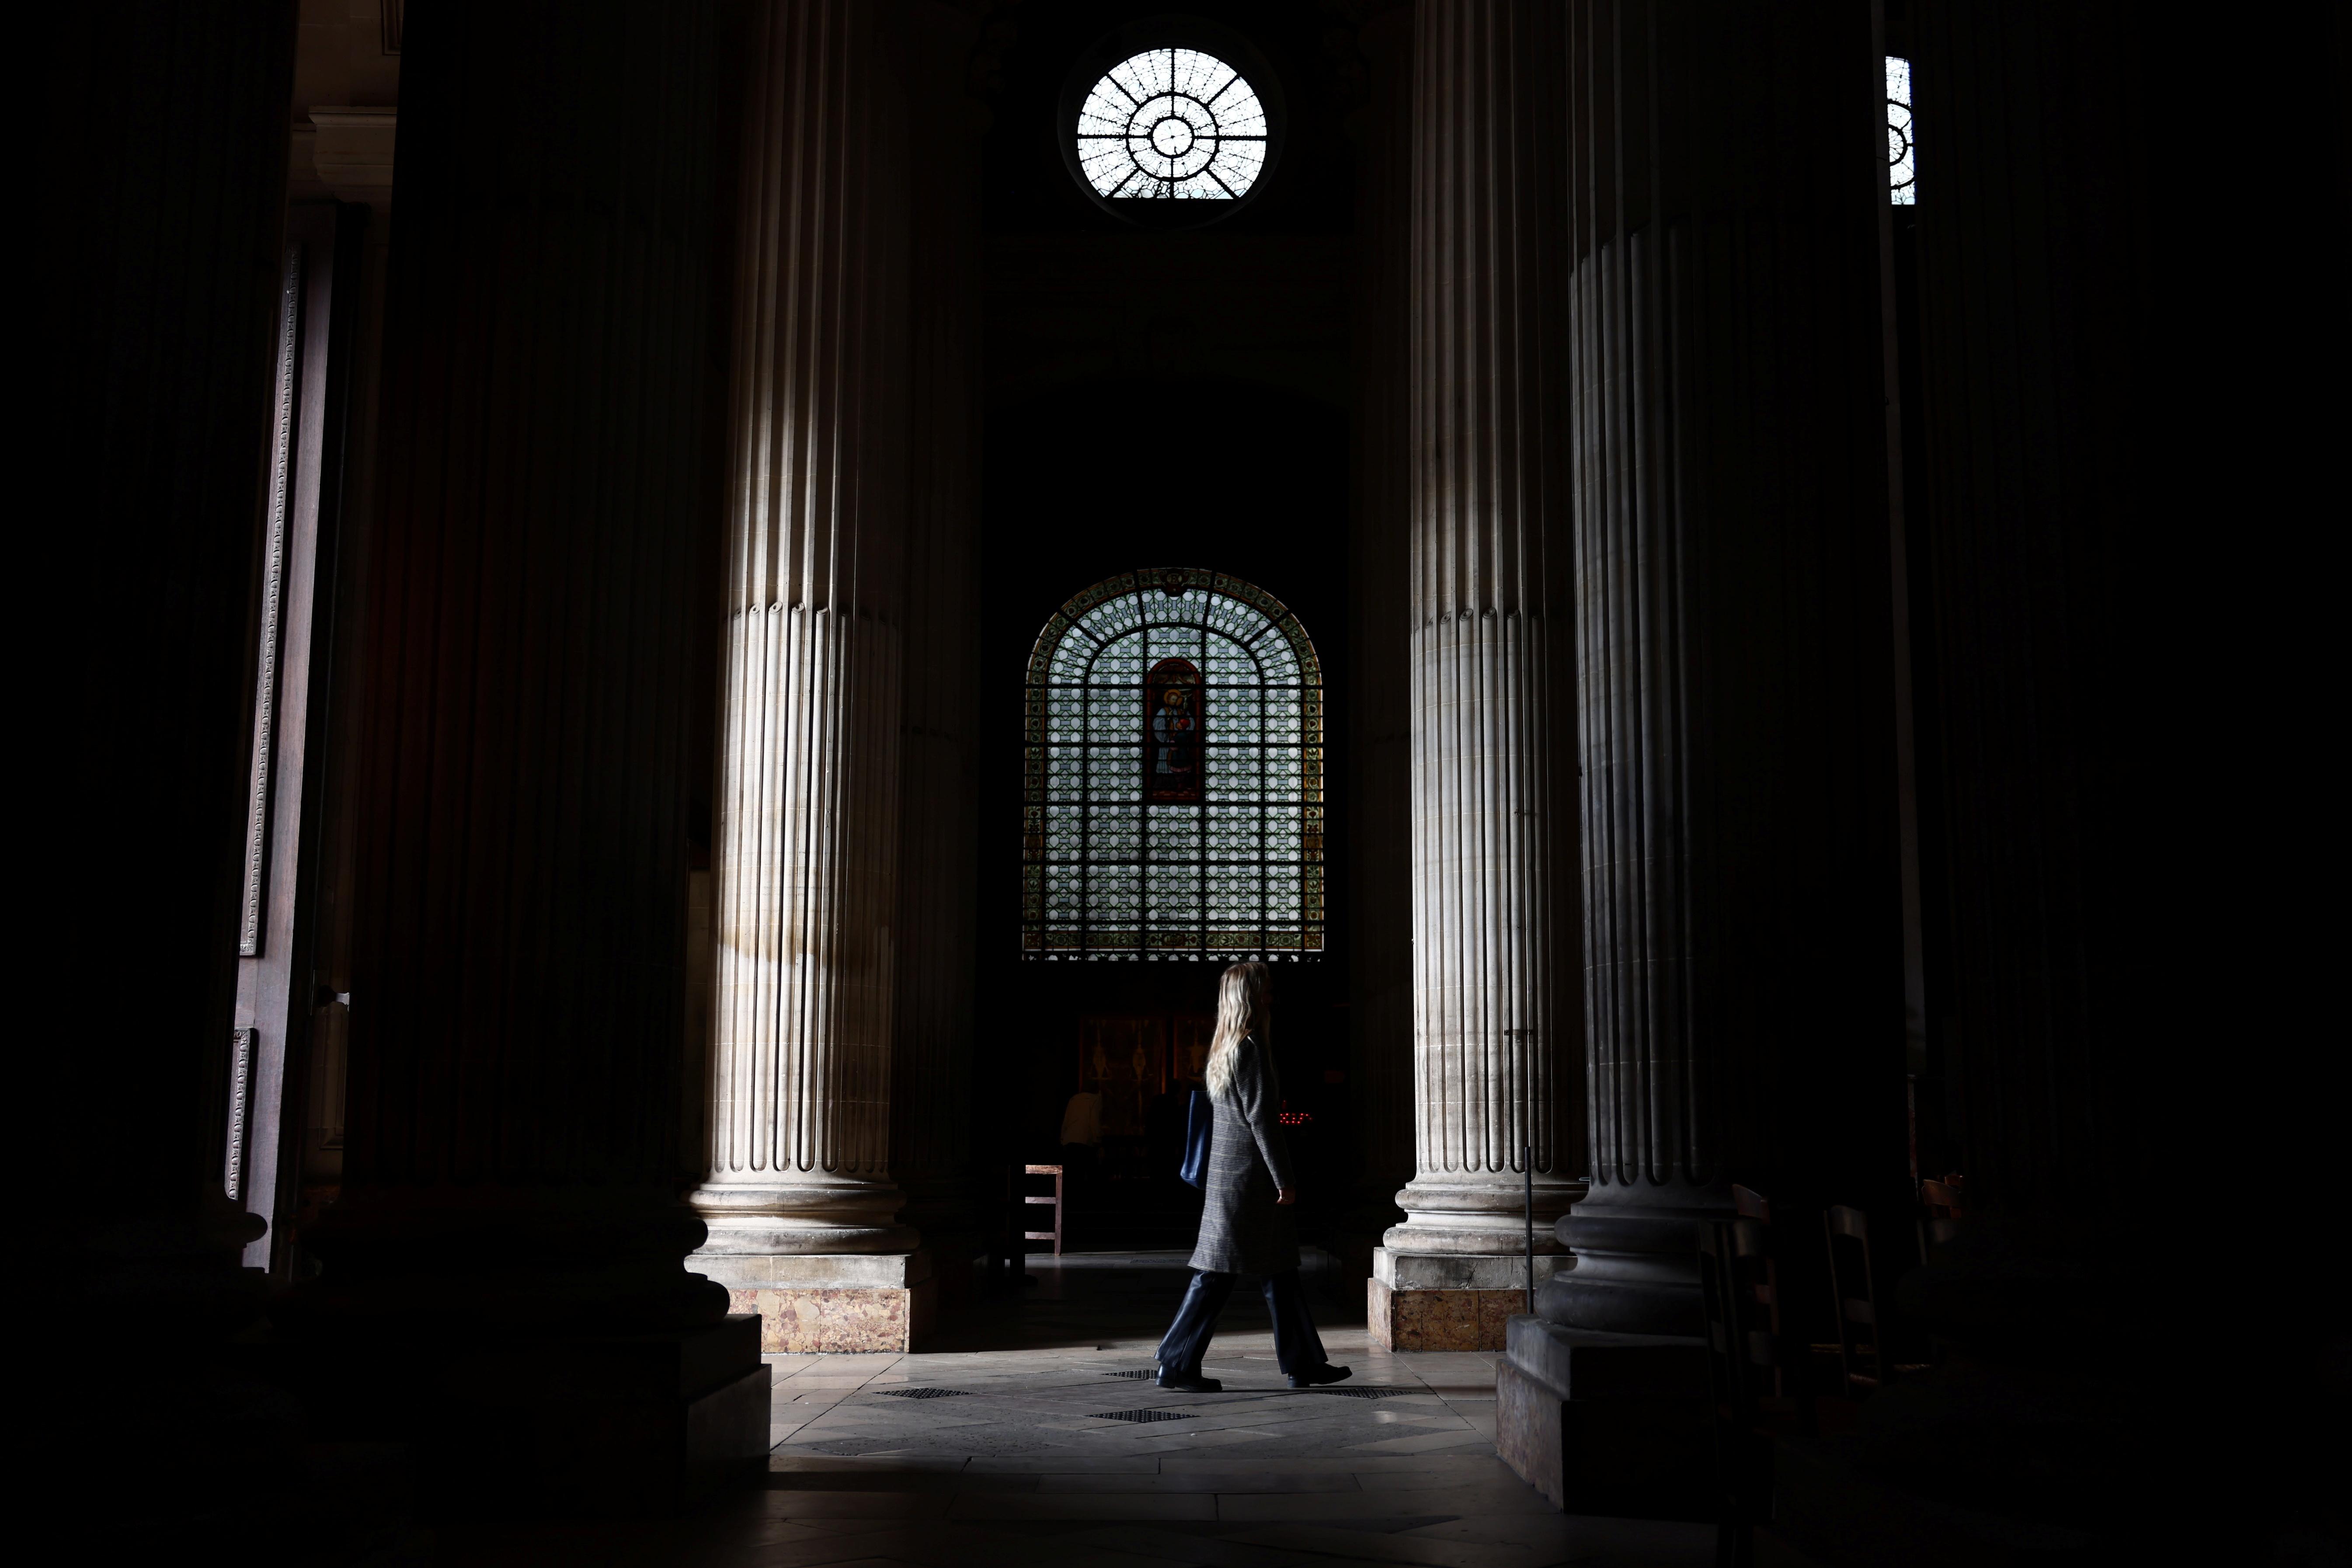 A woman walks into the Saint-Sulpice church in Paris, France, October 4, 2021. REUTERS/Sarah Meyssonnier